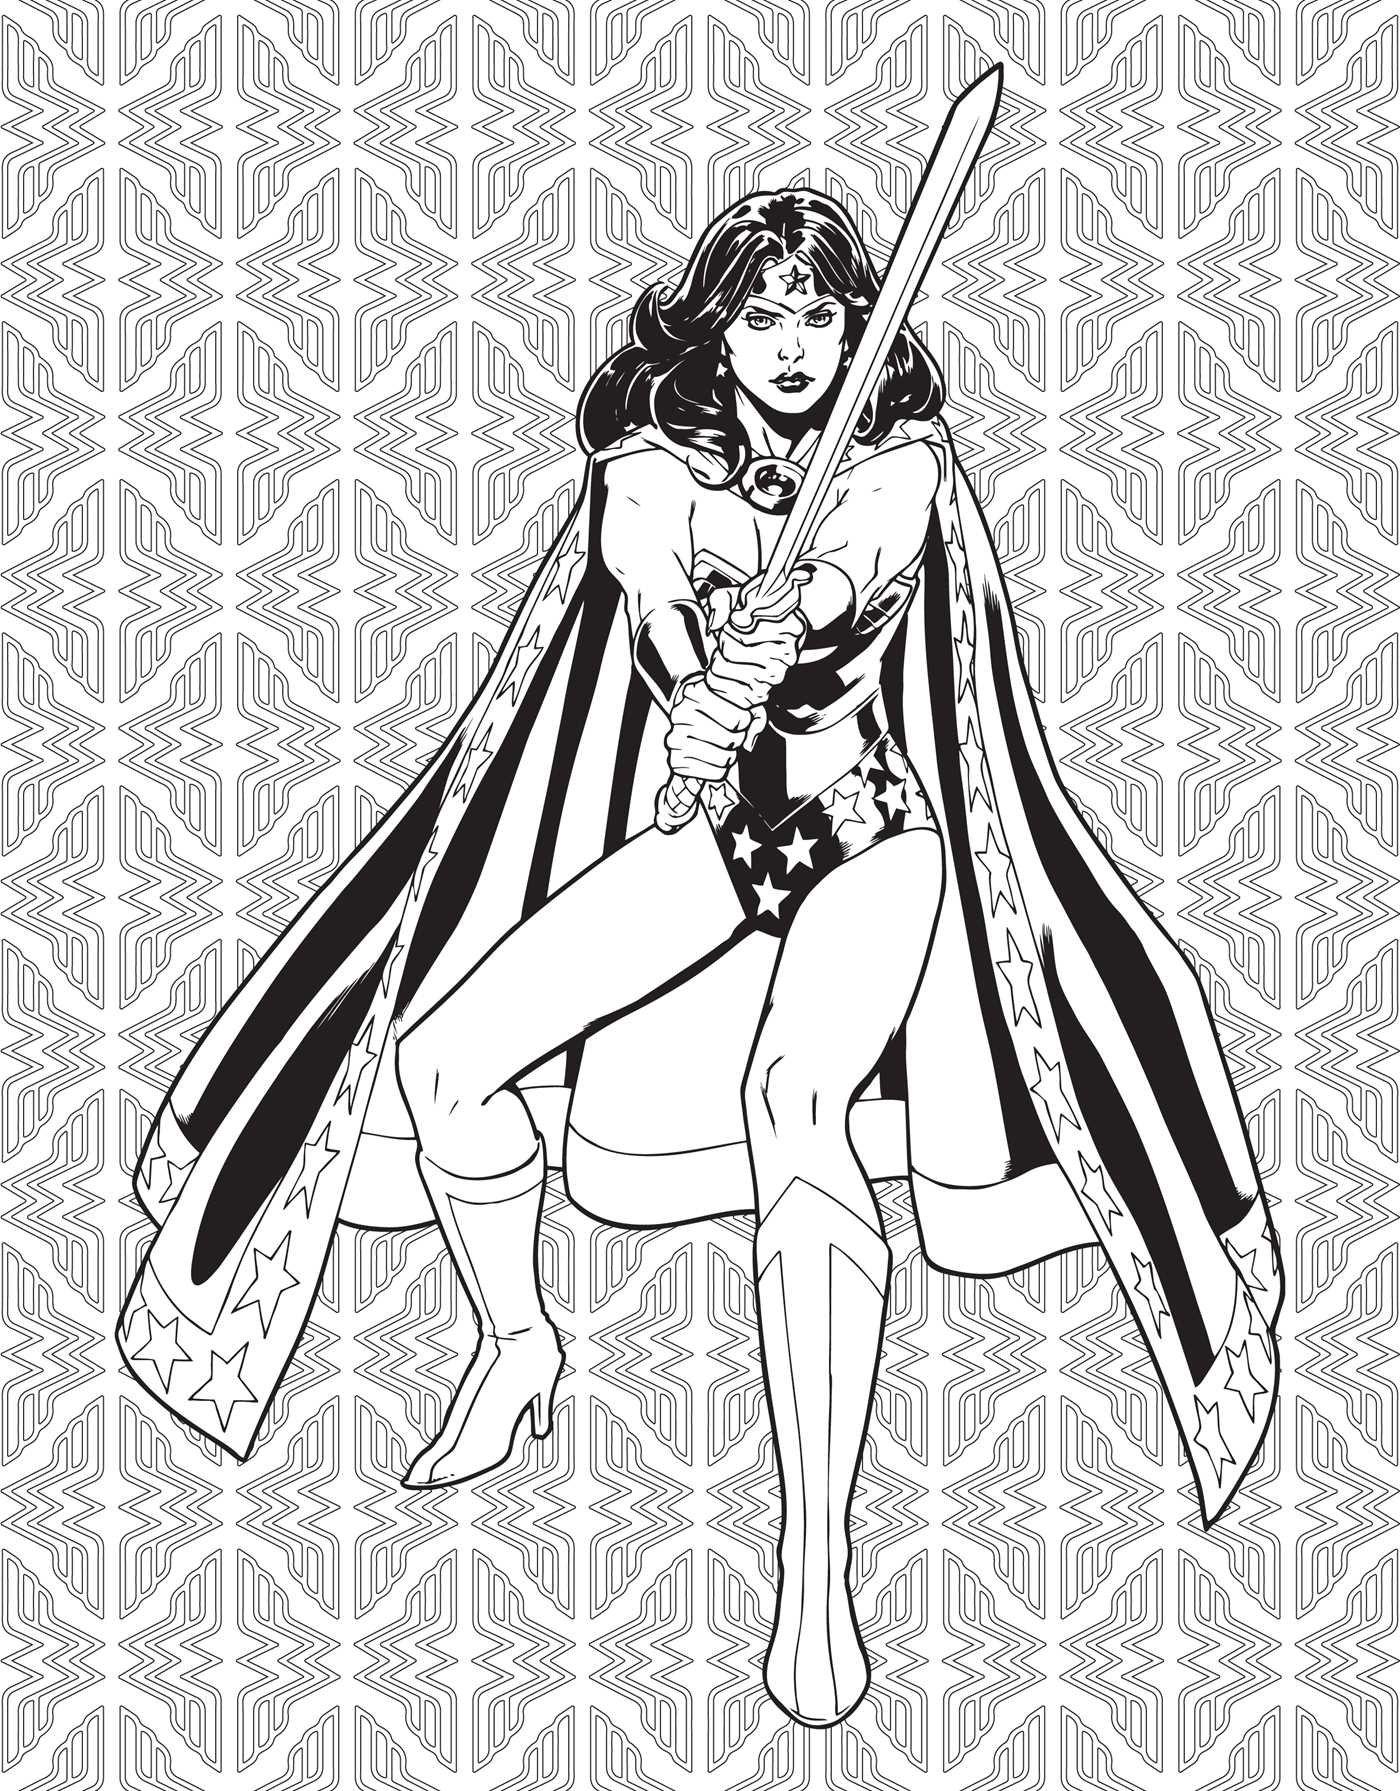 amazon com dc comics wonder woman coloring book 9781608878925